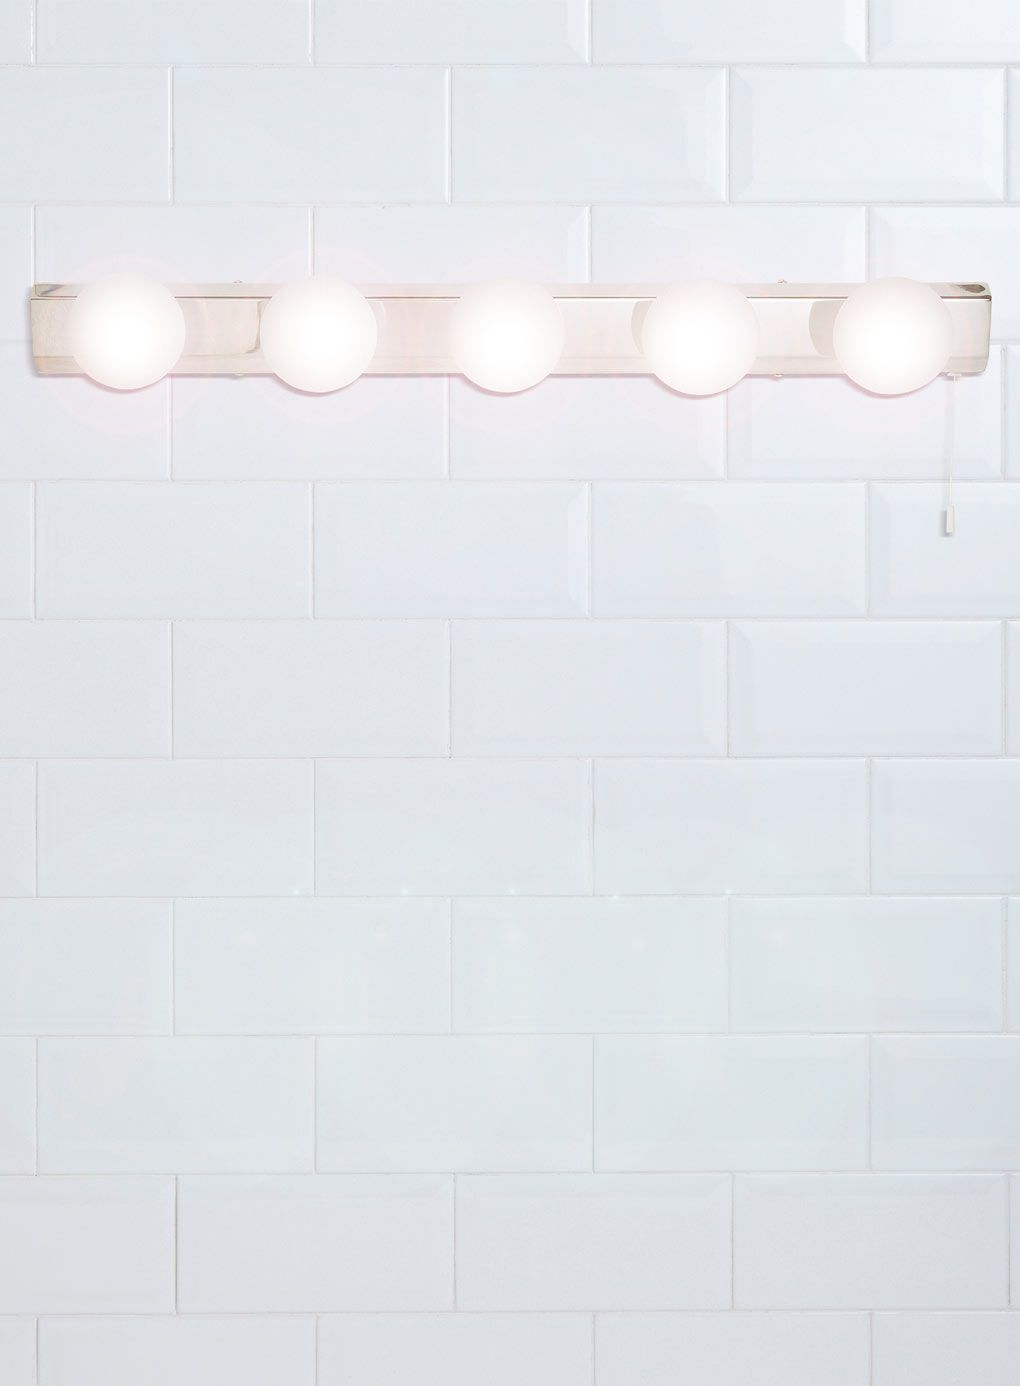 Chrome Ara 5 Light Wall Light Bhs Beauty Fashion Bathroom